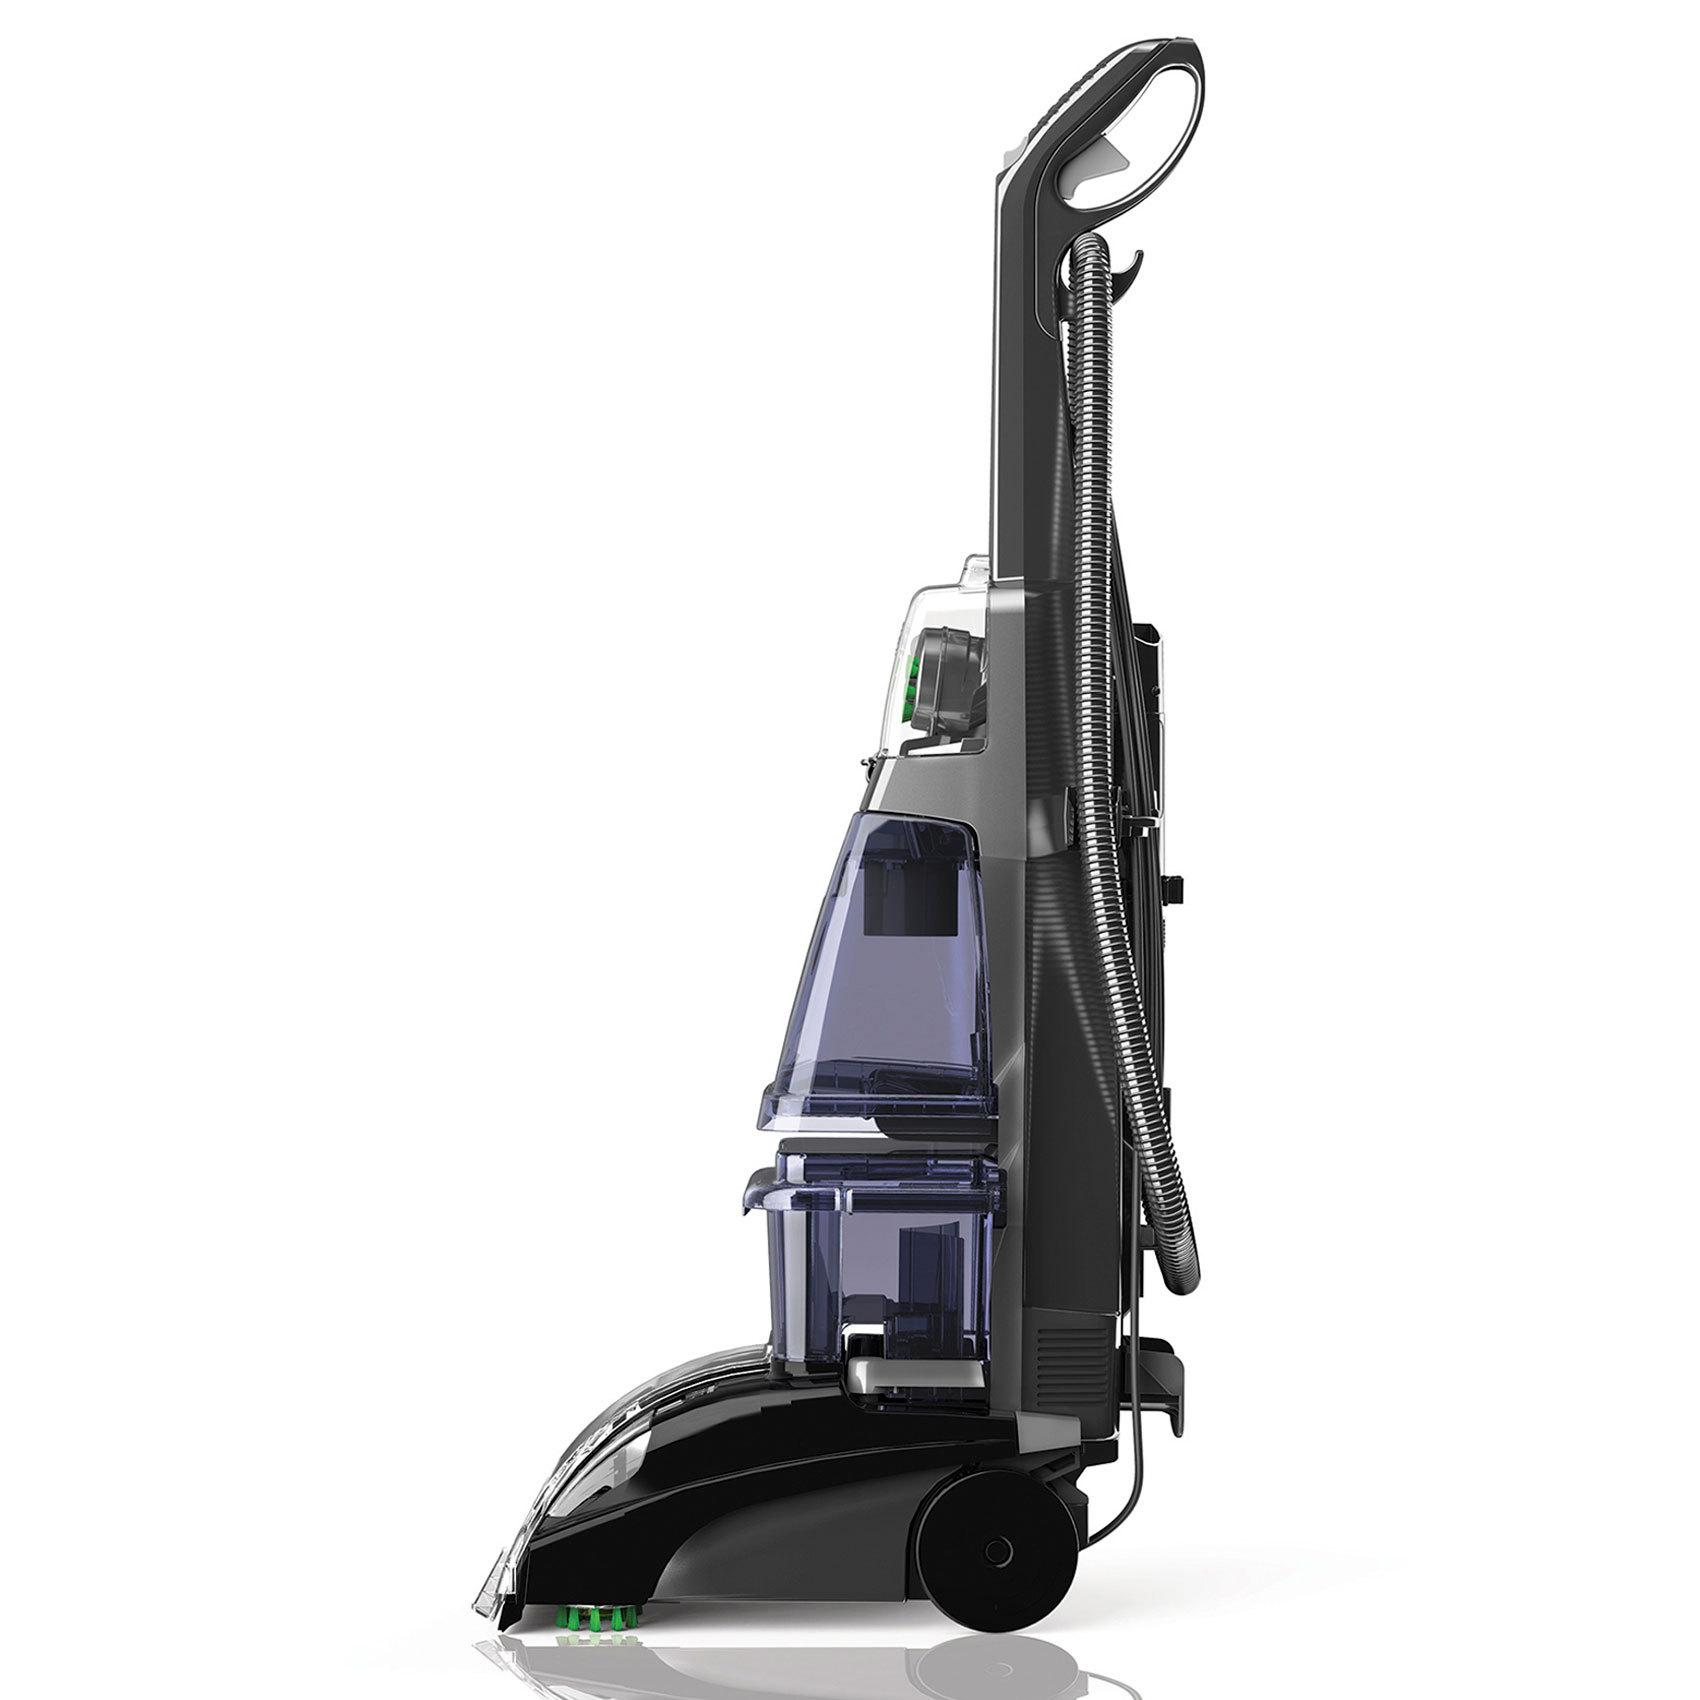 HOOVER UPRIGHT V-CLEANER F5916